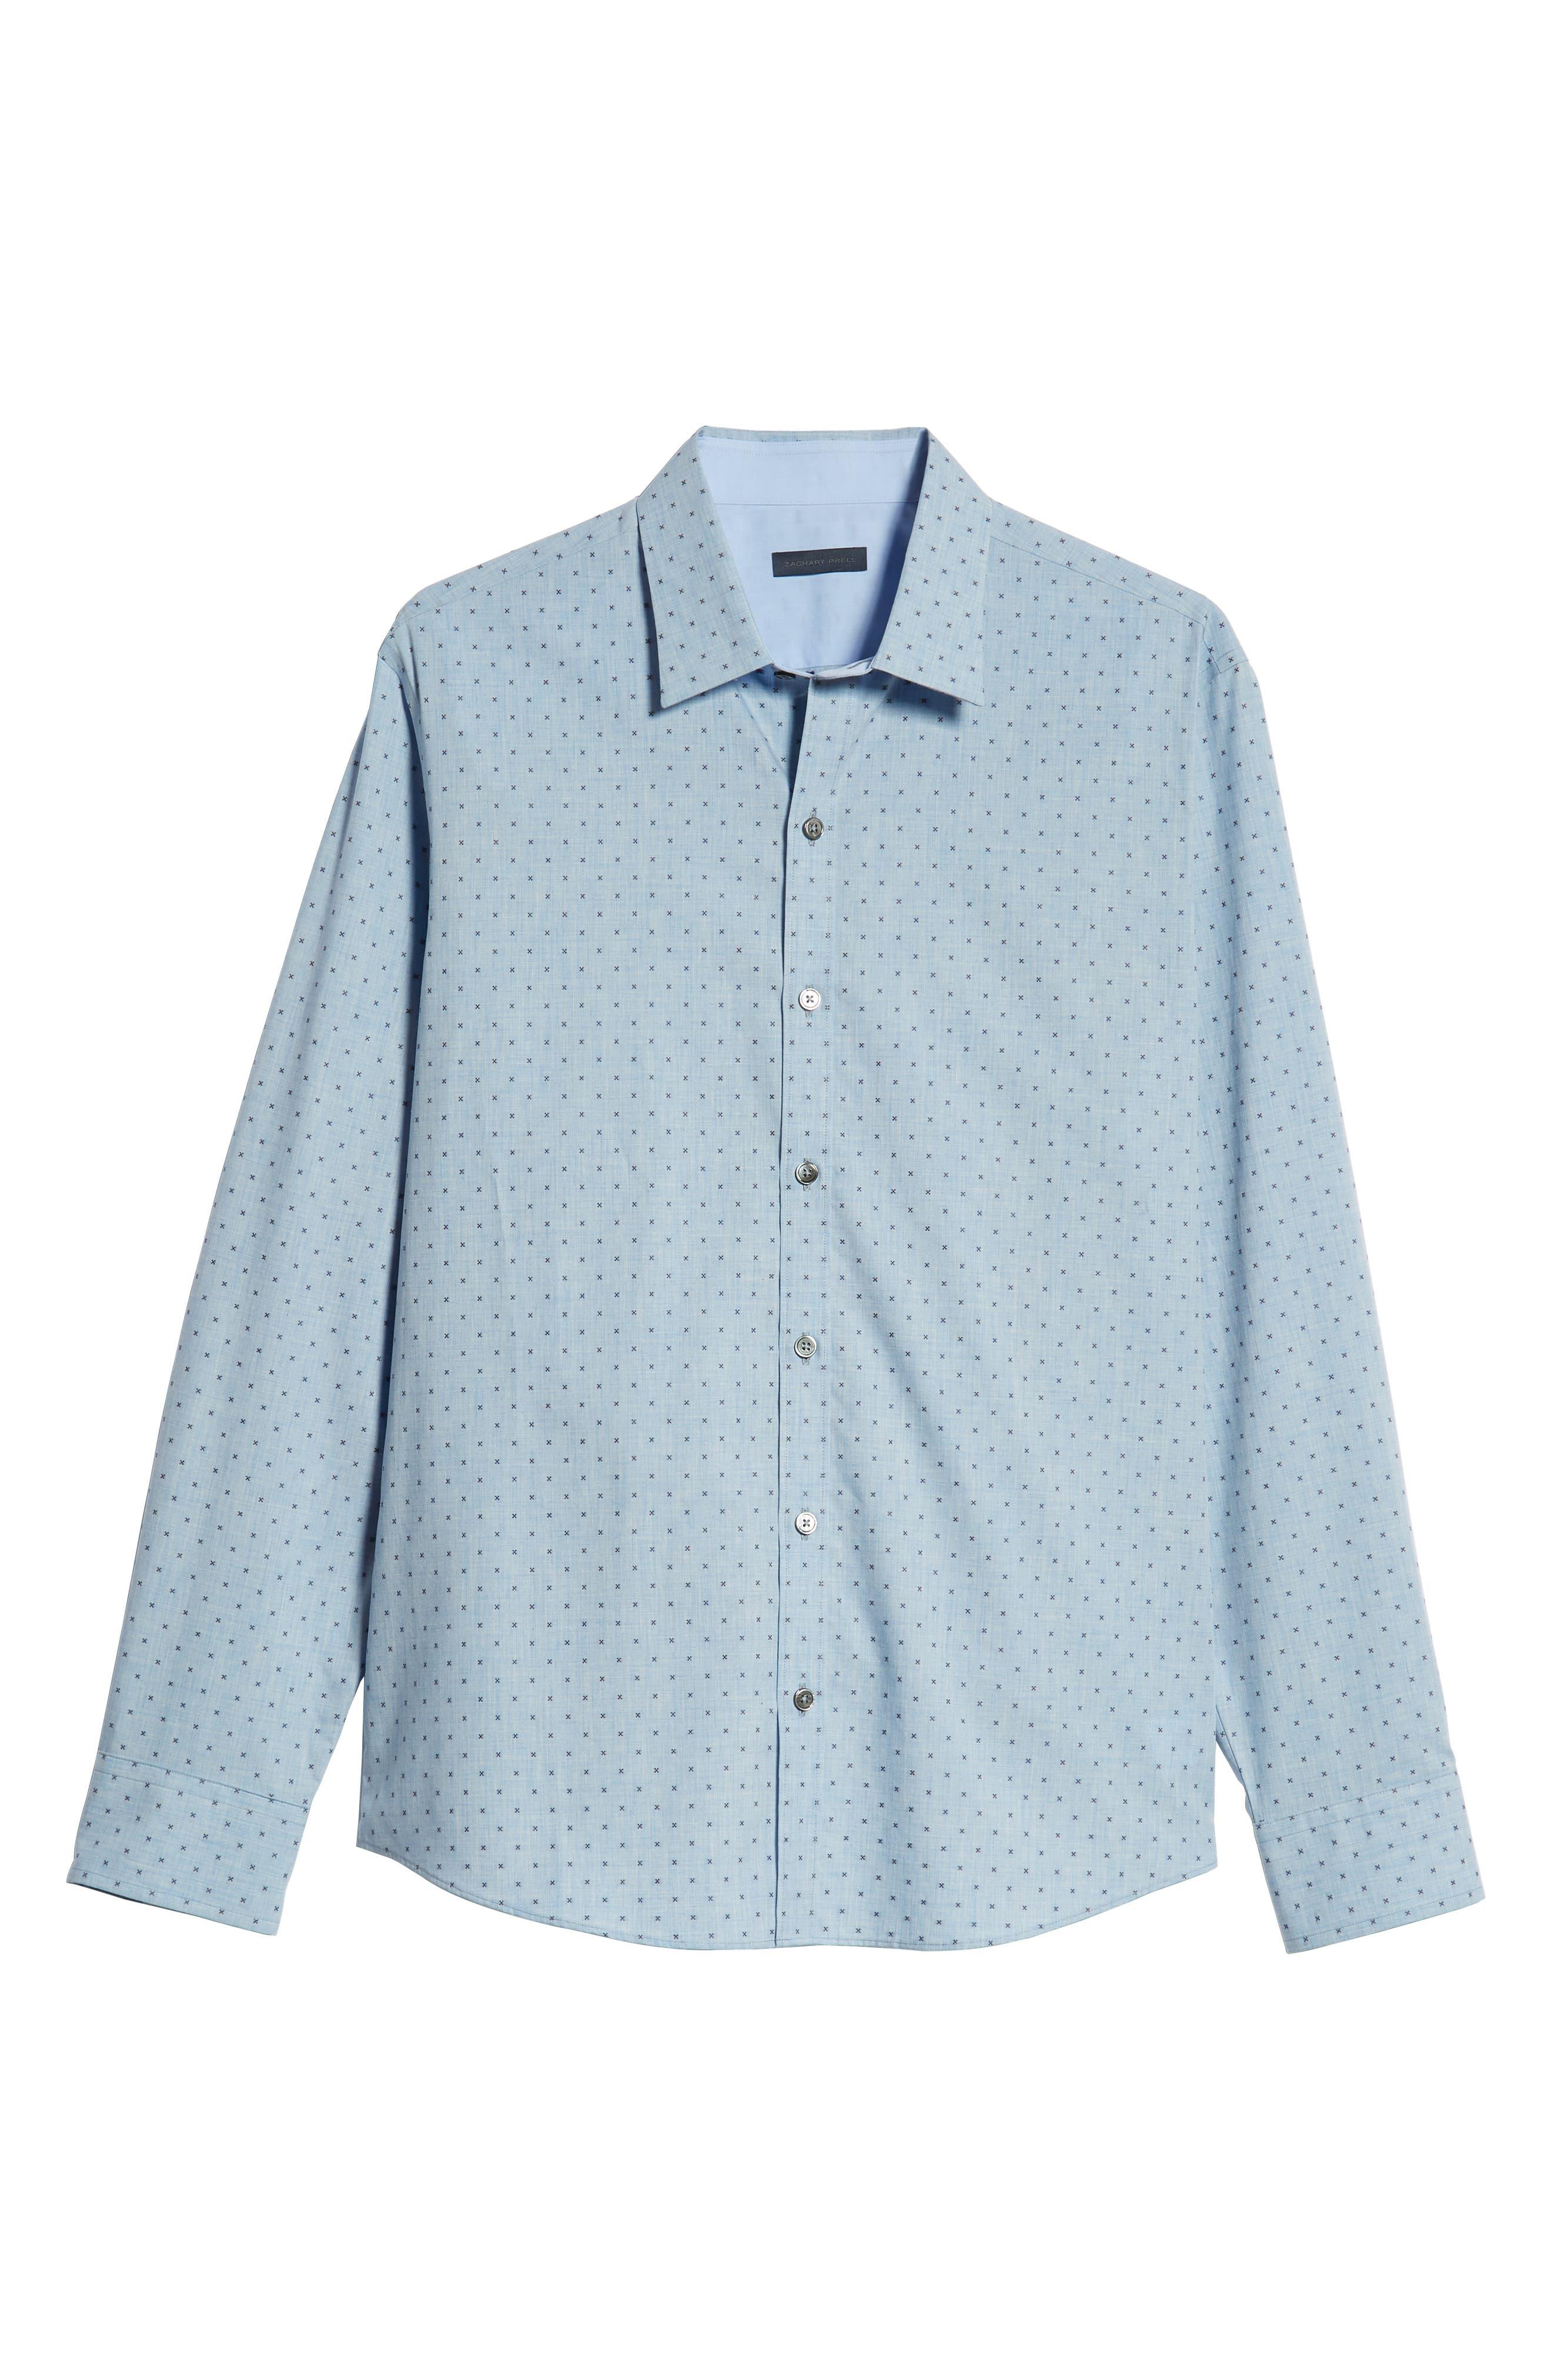 Zhang Regular Fit Sport Shirt,                             Alternate thumbnail 5, color,                             LIGHT BLUE